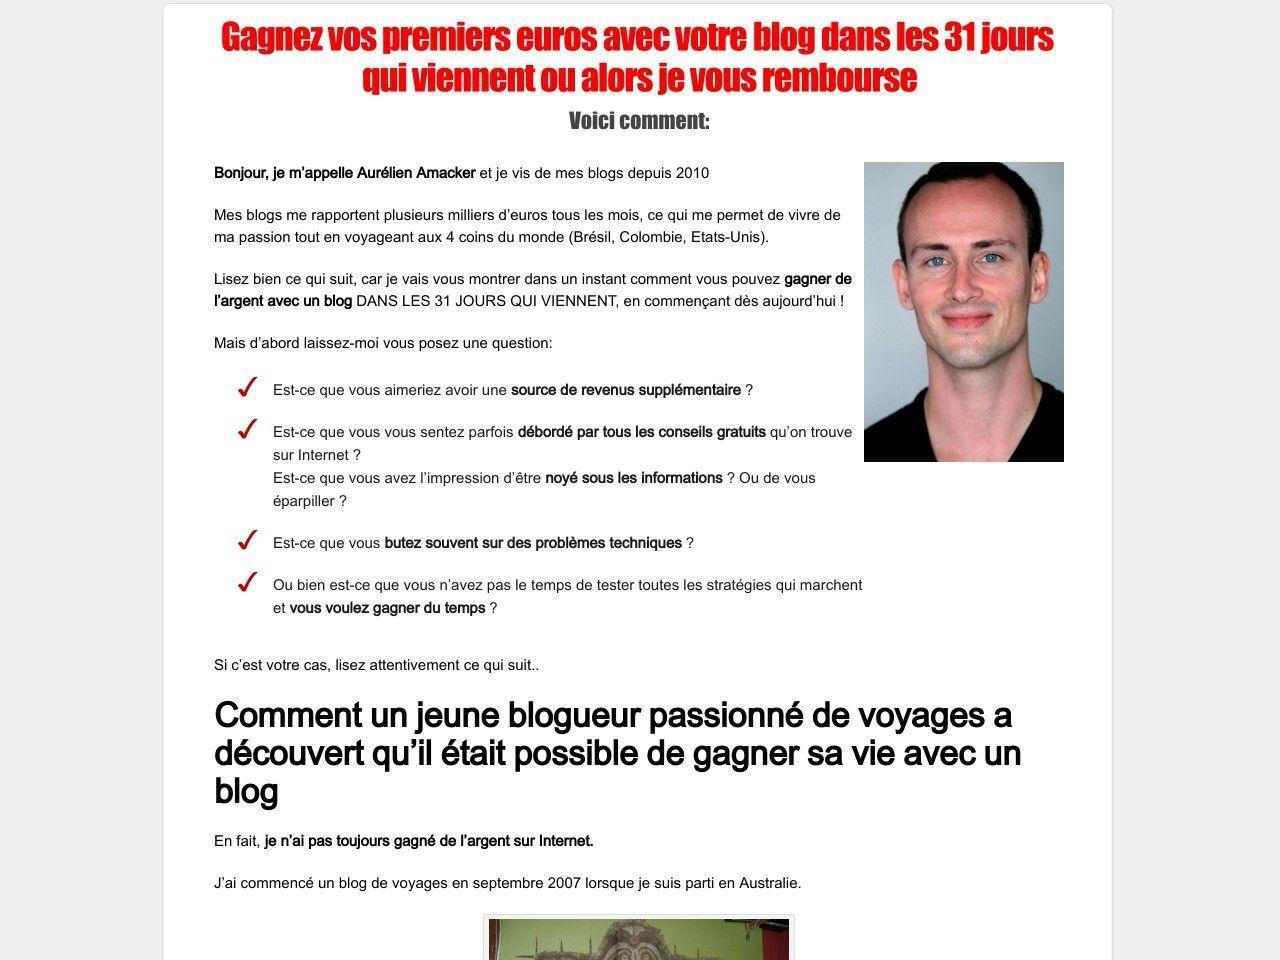 ① Un Blog Qui Rapporte En 31 Jours - http://www.vnulab.be/lab-review/%e2%91%a0-un-blog-qui-rapporte-en-31-jours